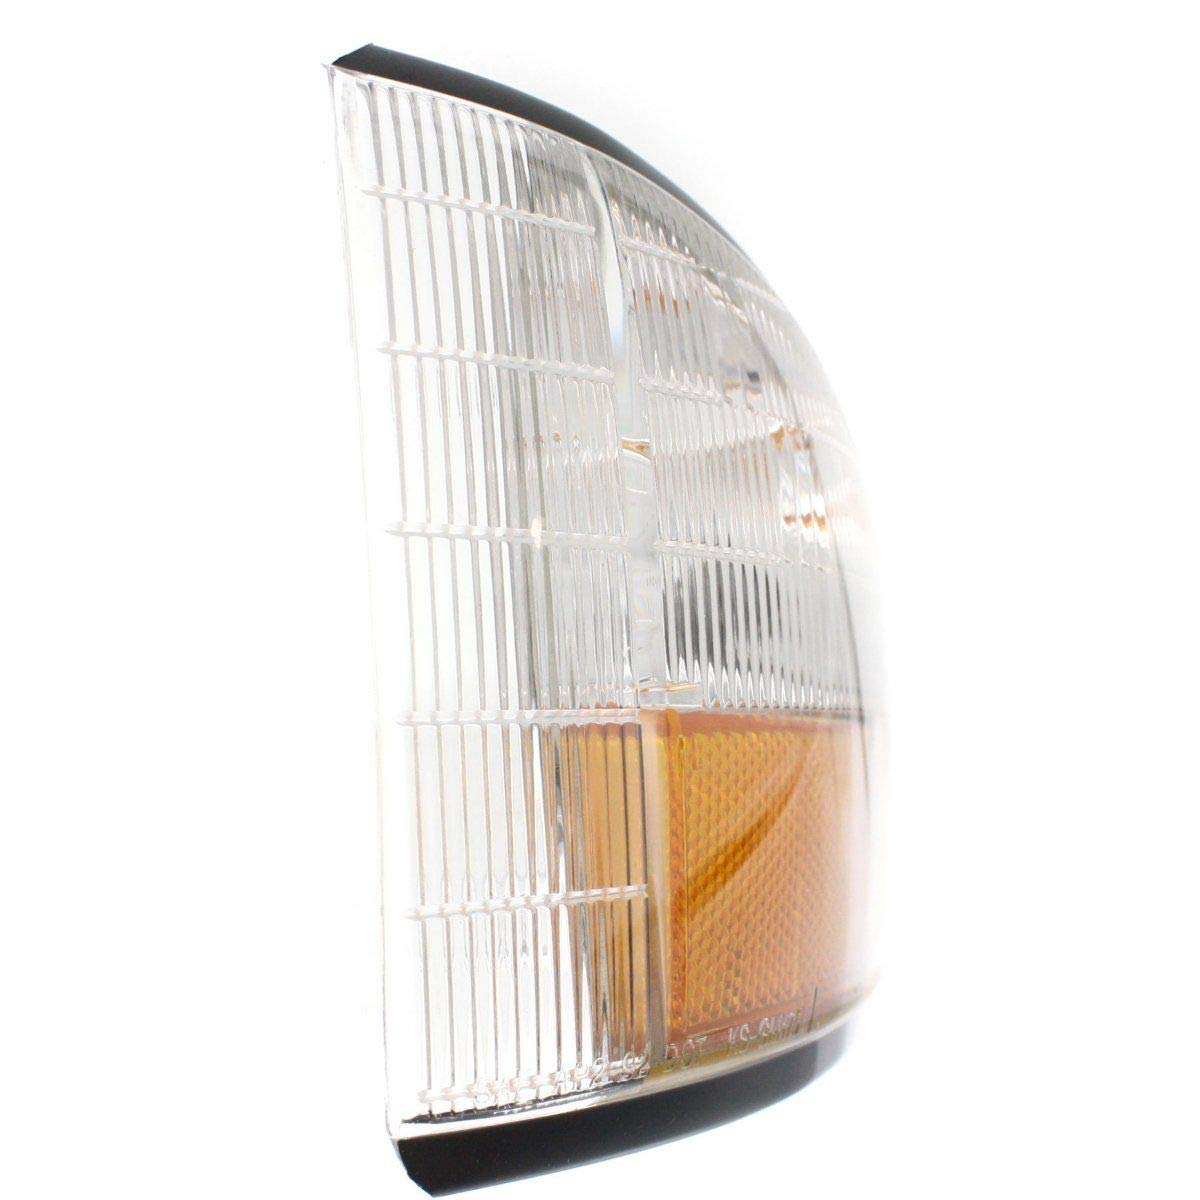 Corner Light For 92-95 Pontiac Bonneville Passenger Side Incandescent